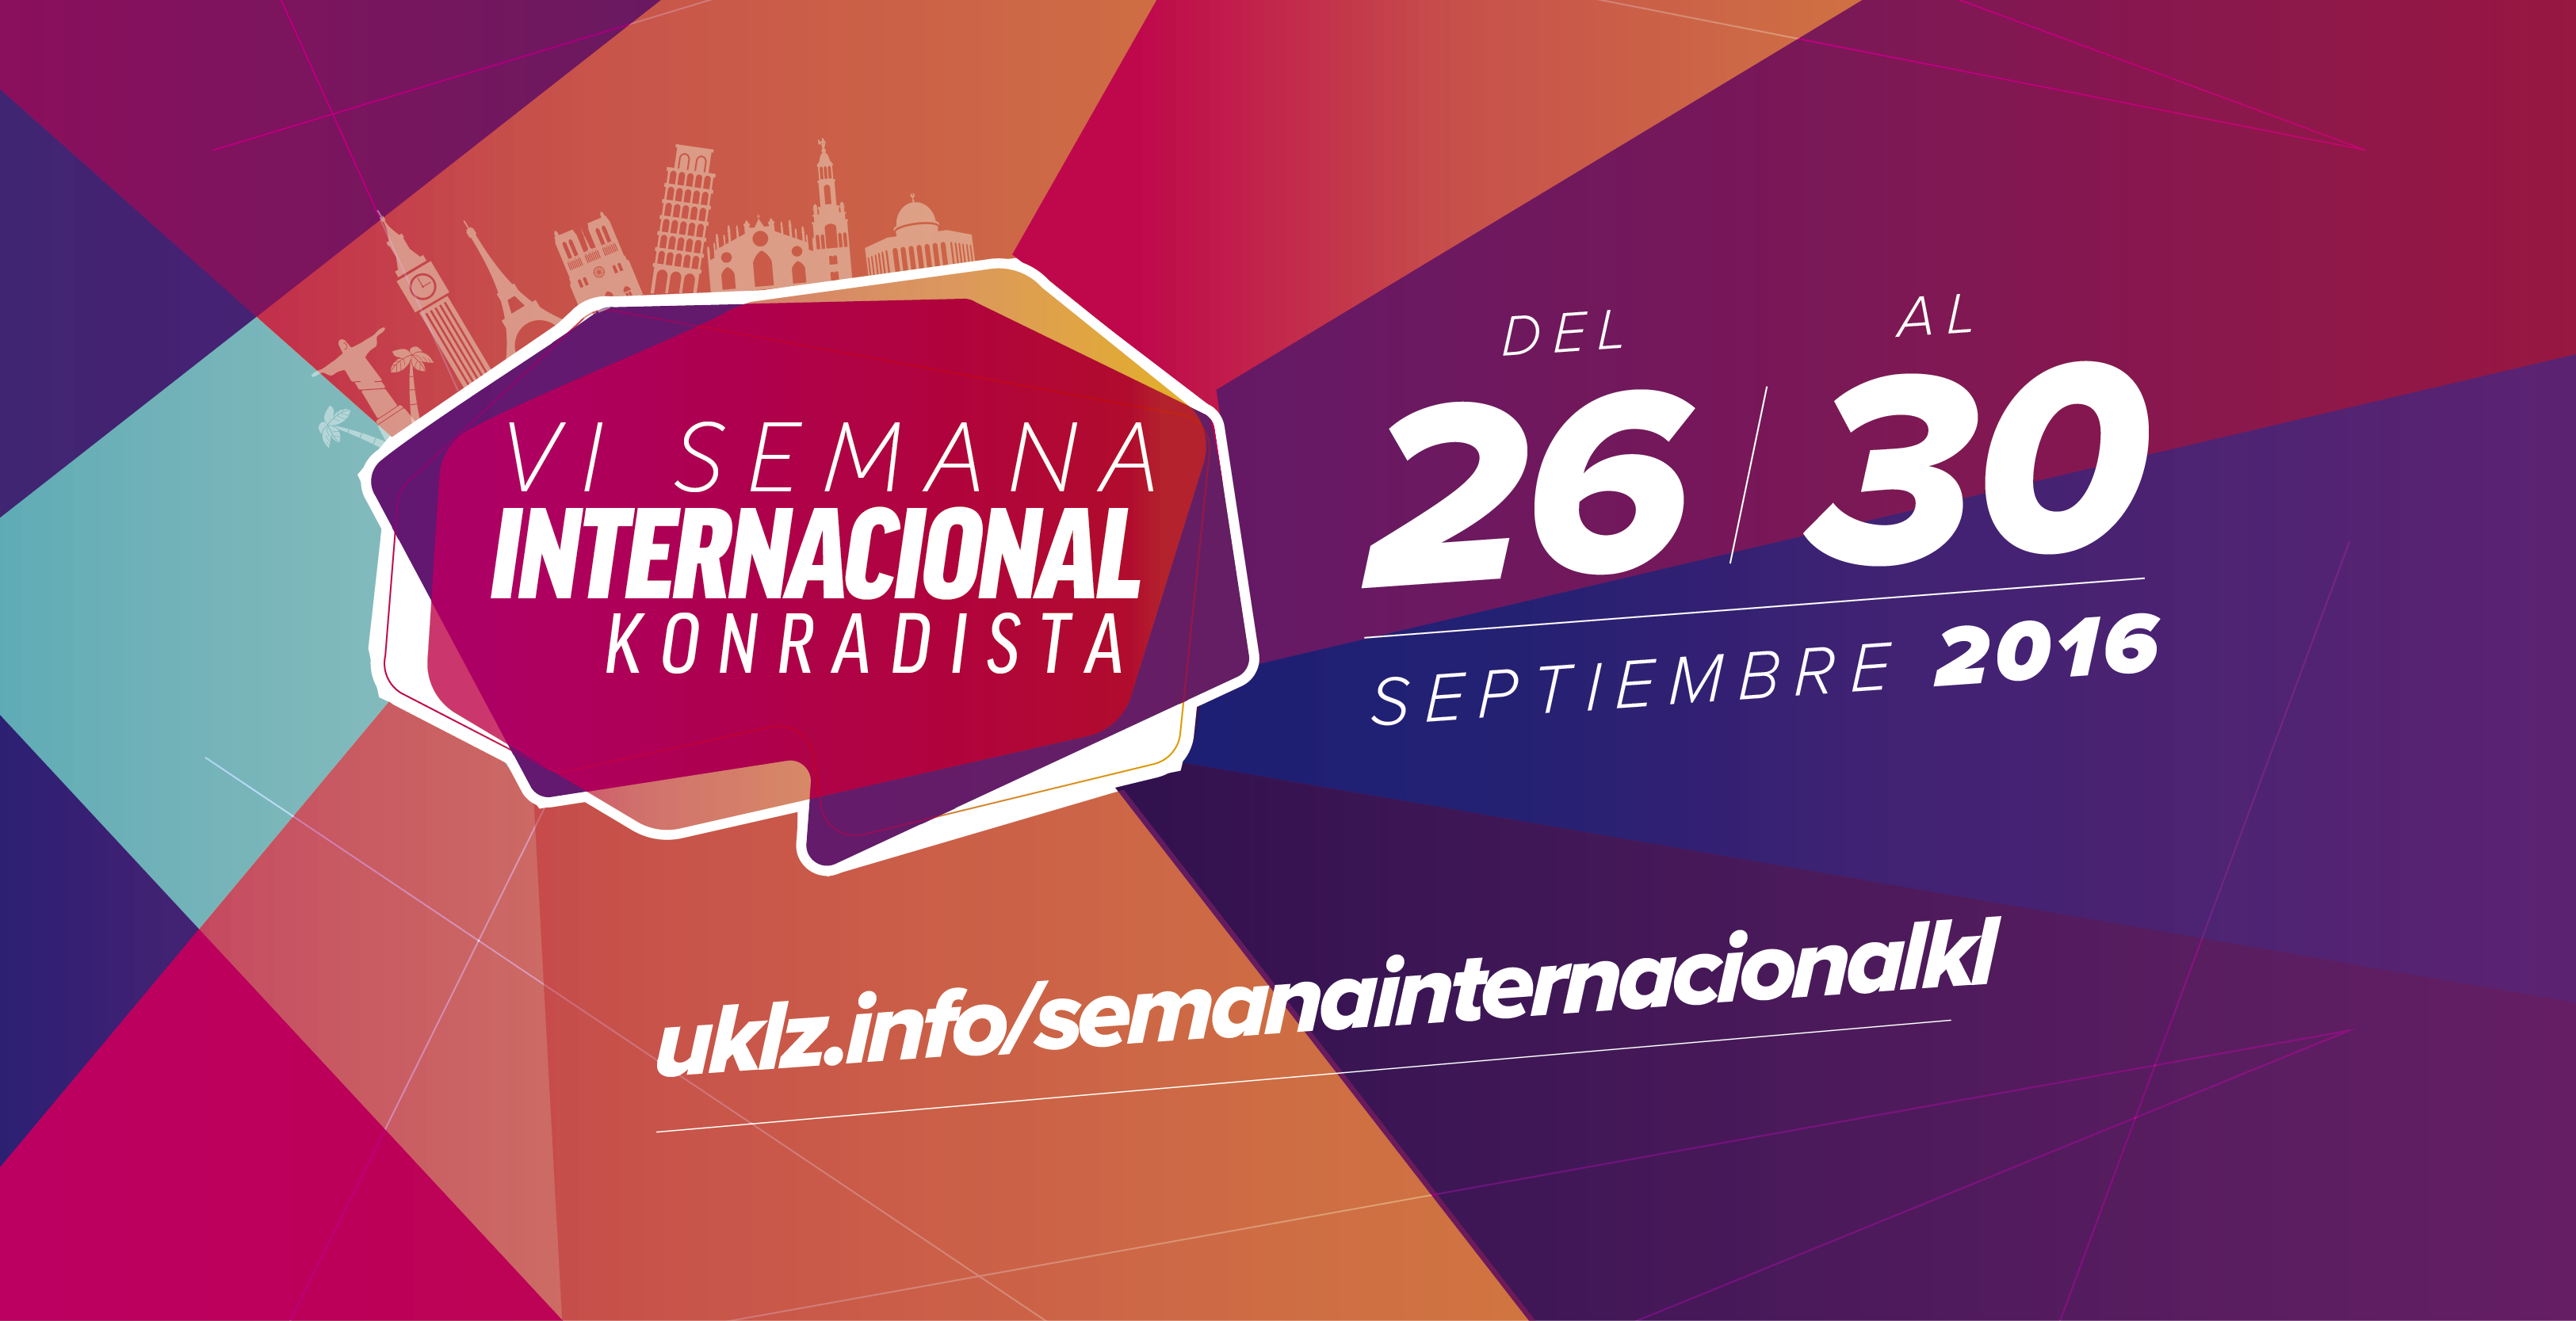 VI Semana Internacional Konradista del 26 al 30 de septiembre